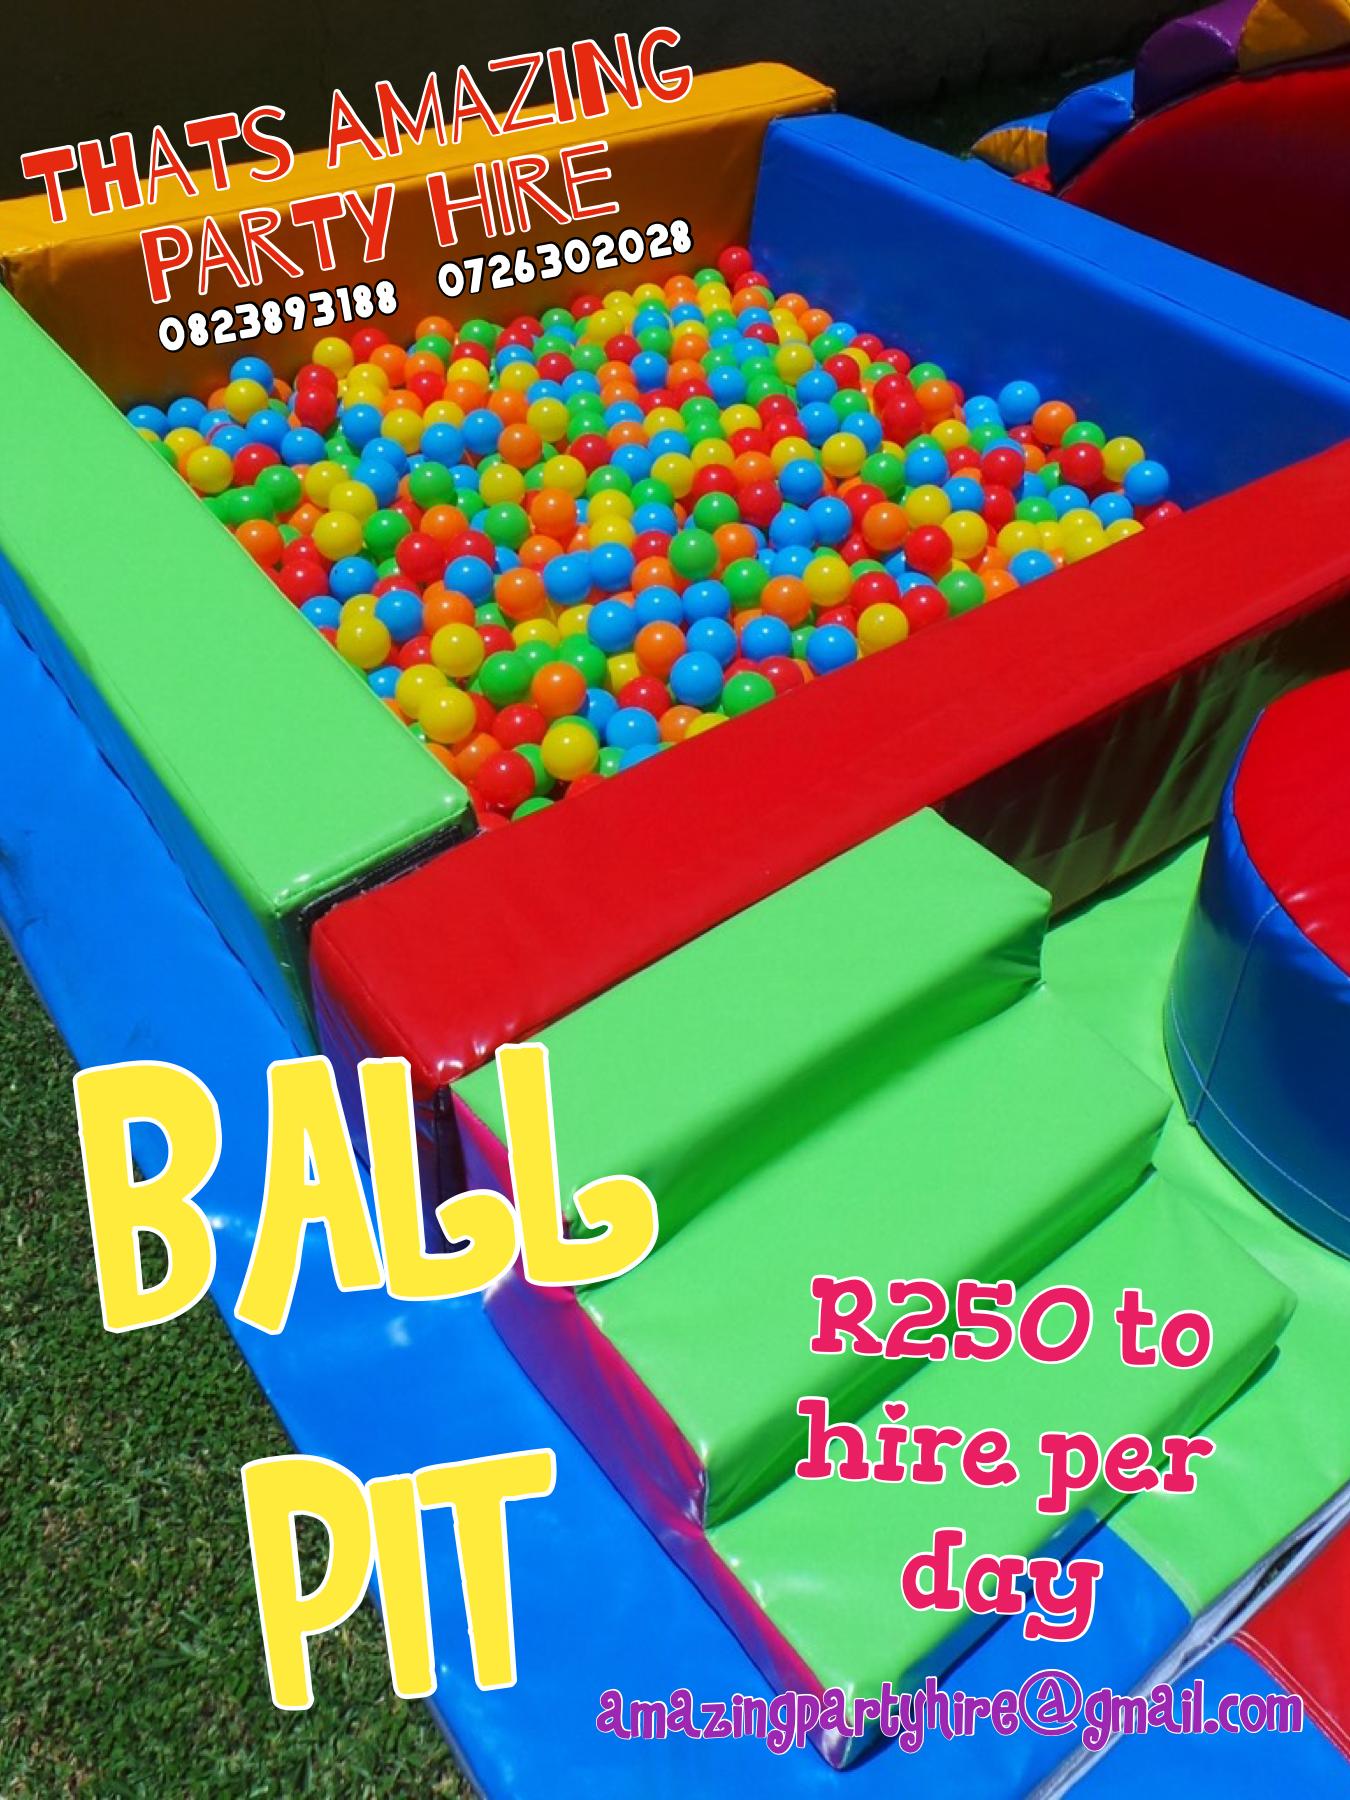 Ballpit